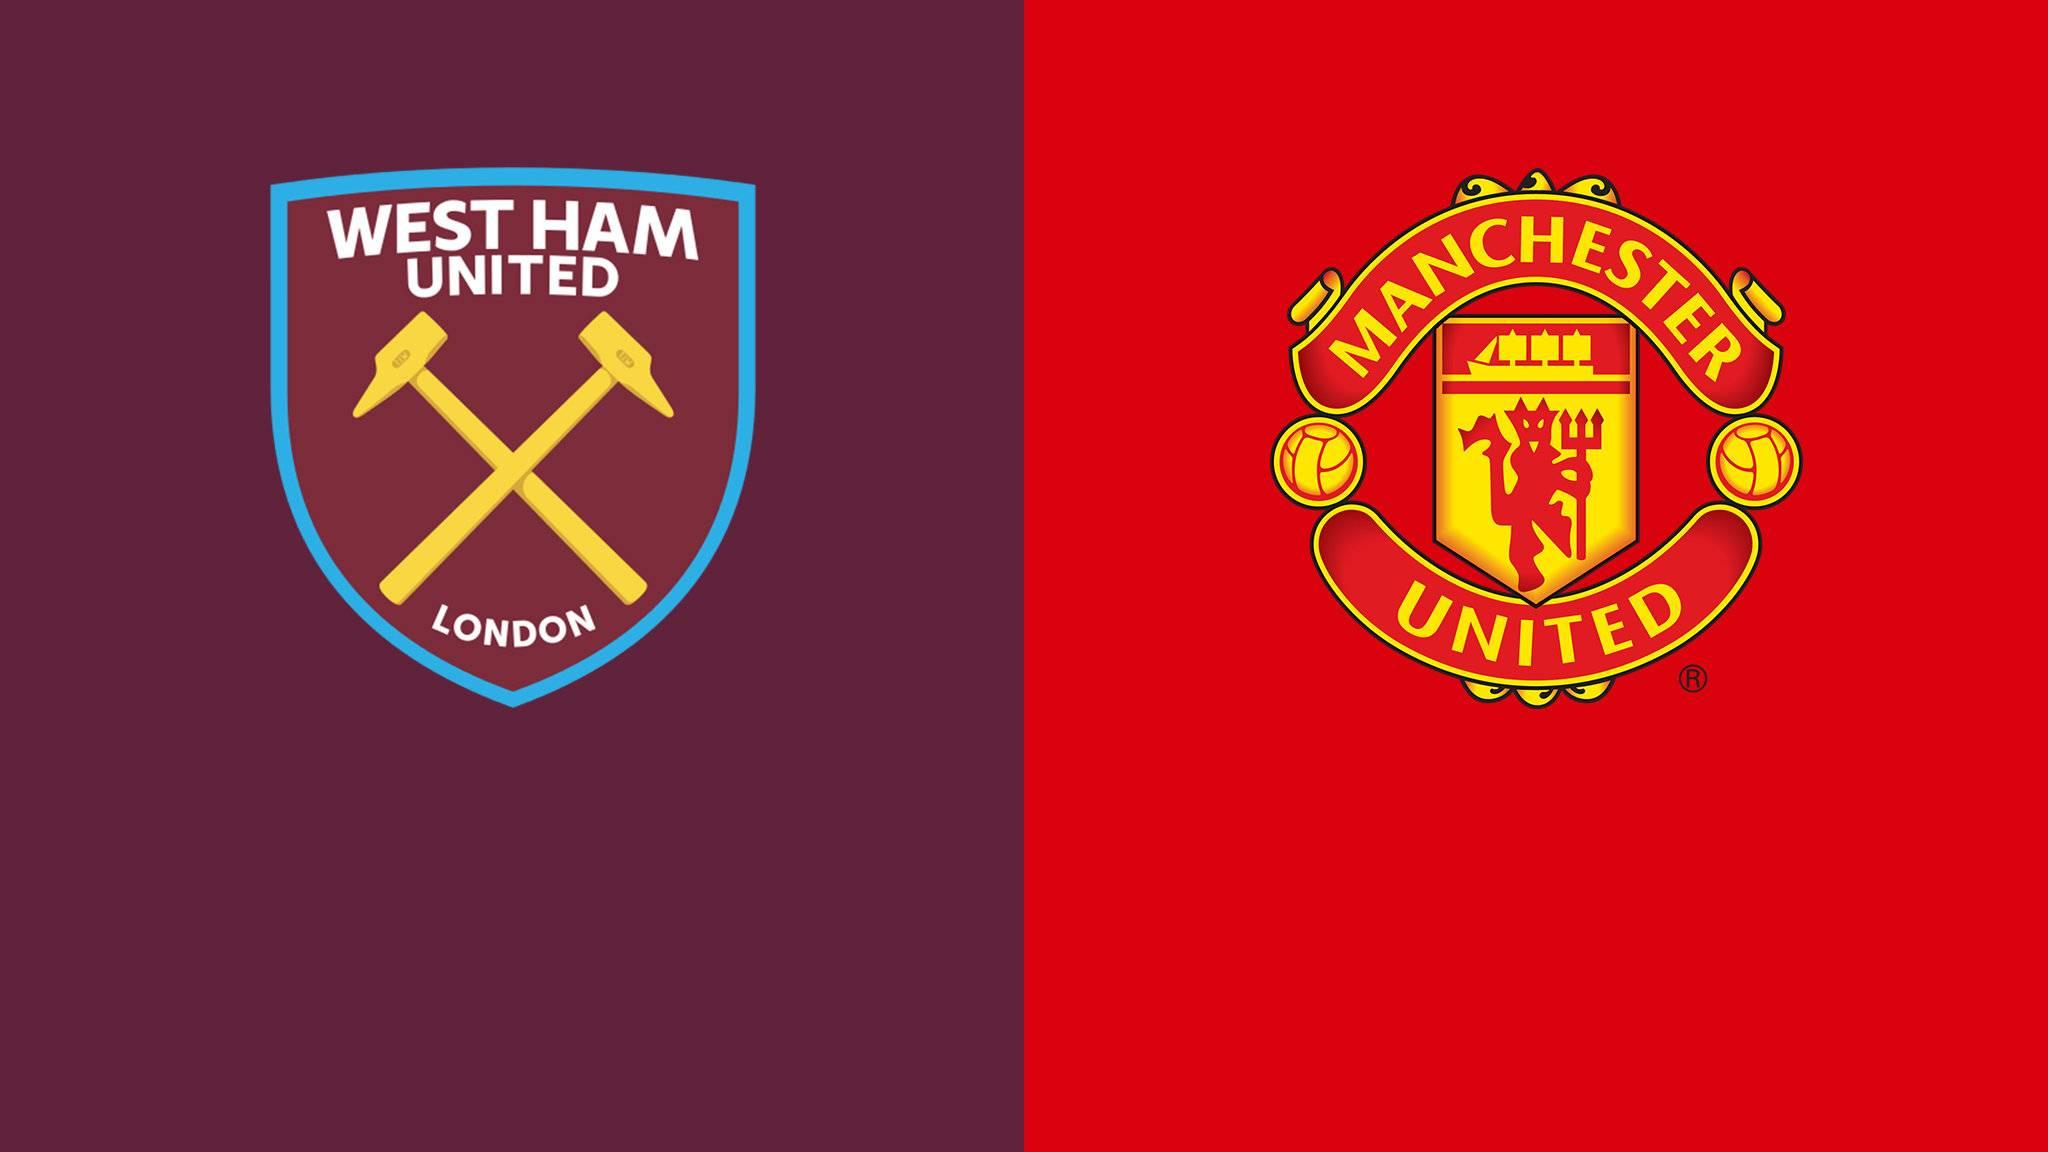 Manchester United vs West Ham live predictions